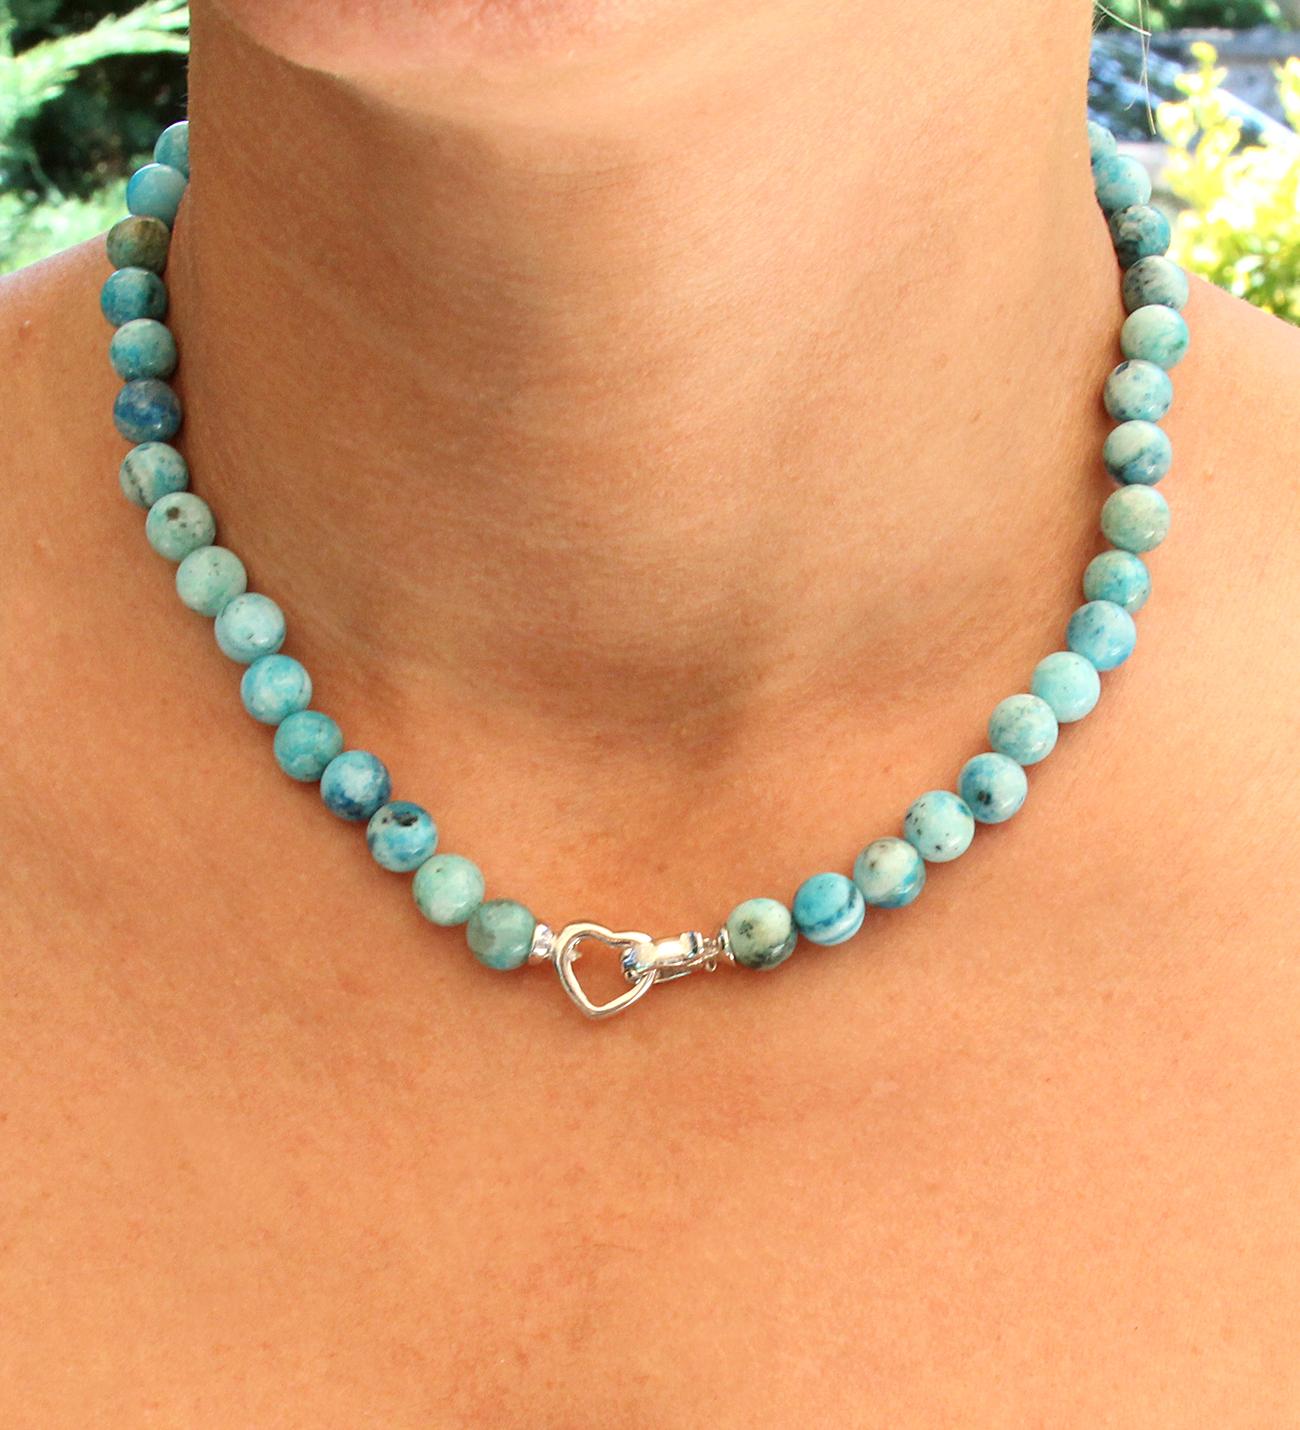 Women's Natural Hemimorphite Gem Necklace